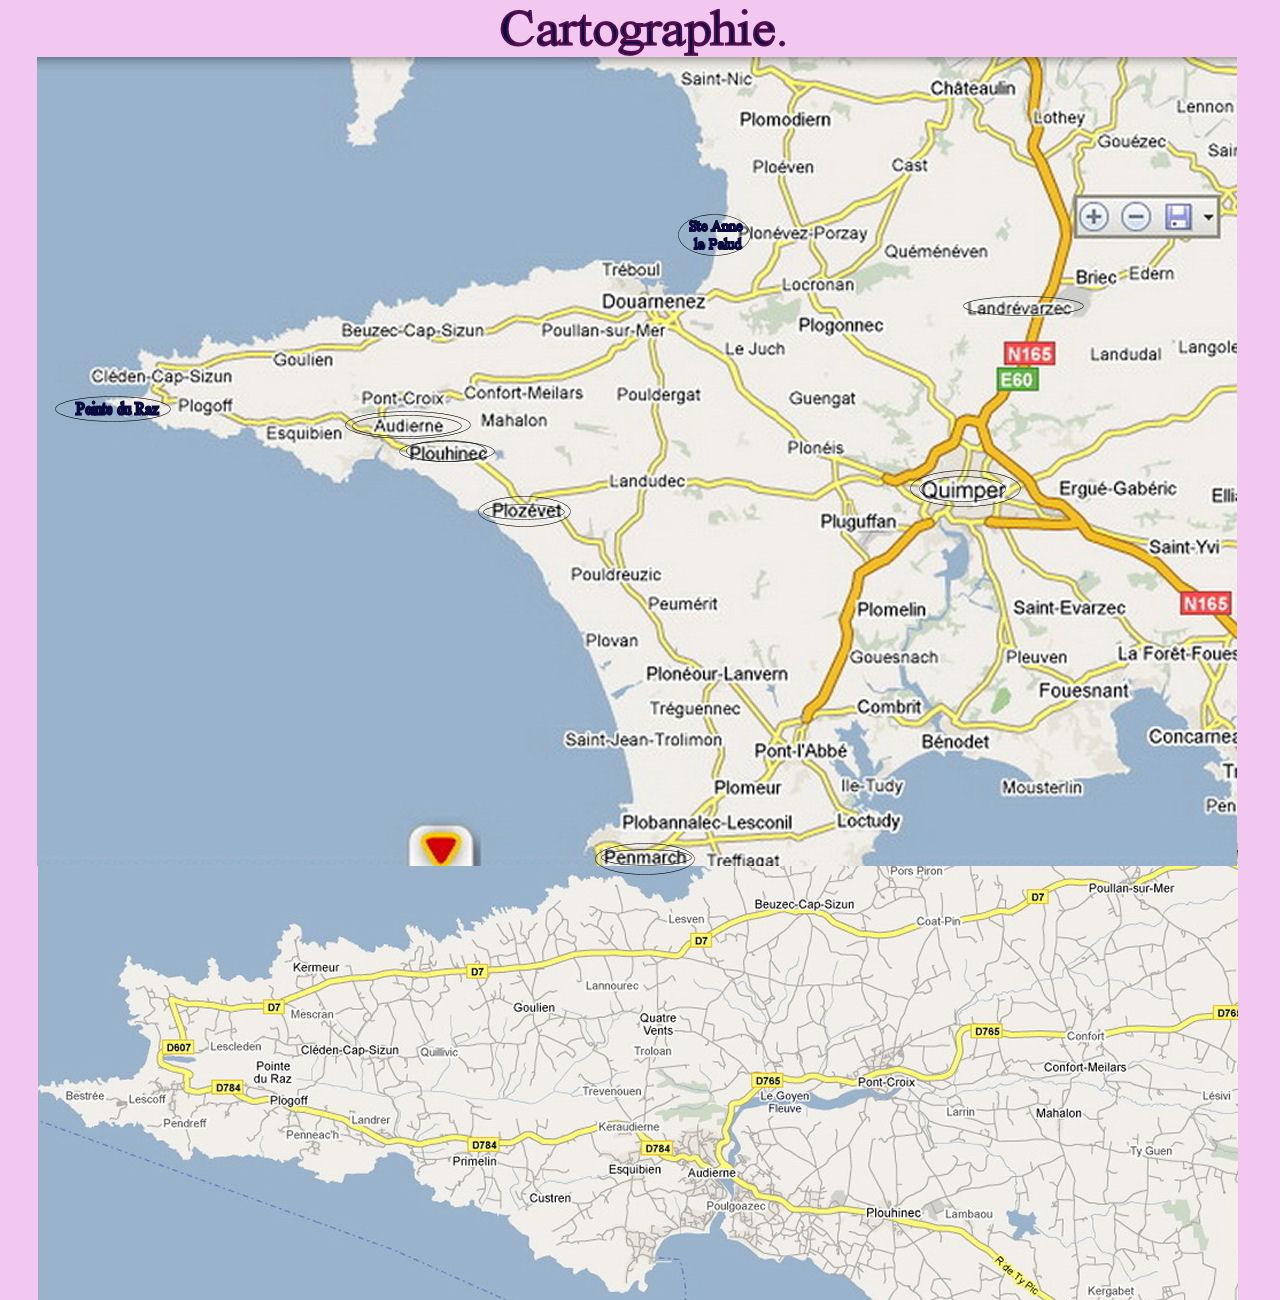 cartographie.jpg